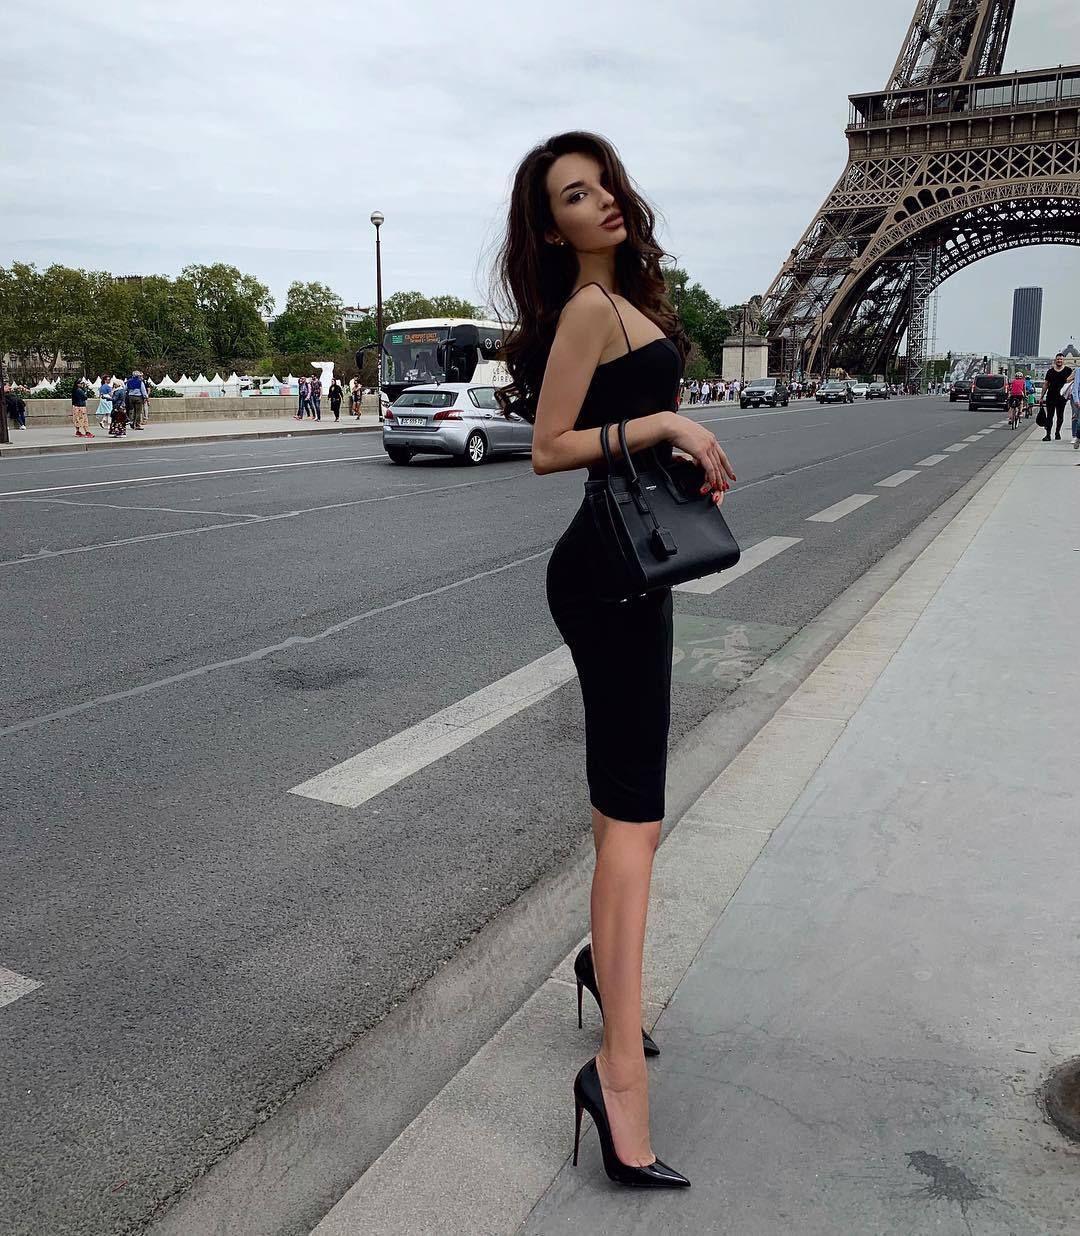 Pin By Alexis Mack On Long Lean Fashion Edgy Fashion Style [ 1236 x 1080 Pixel ]